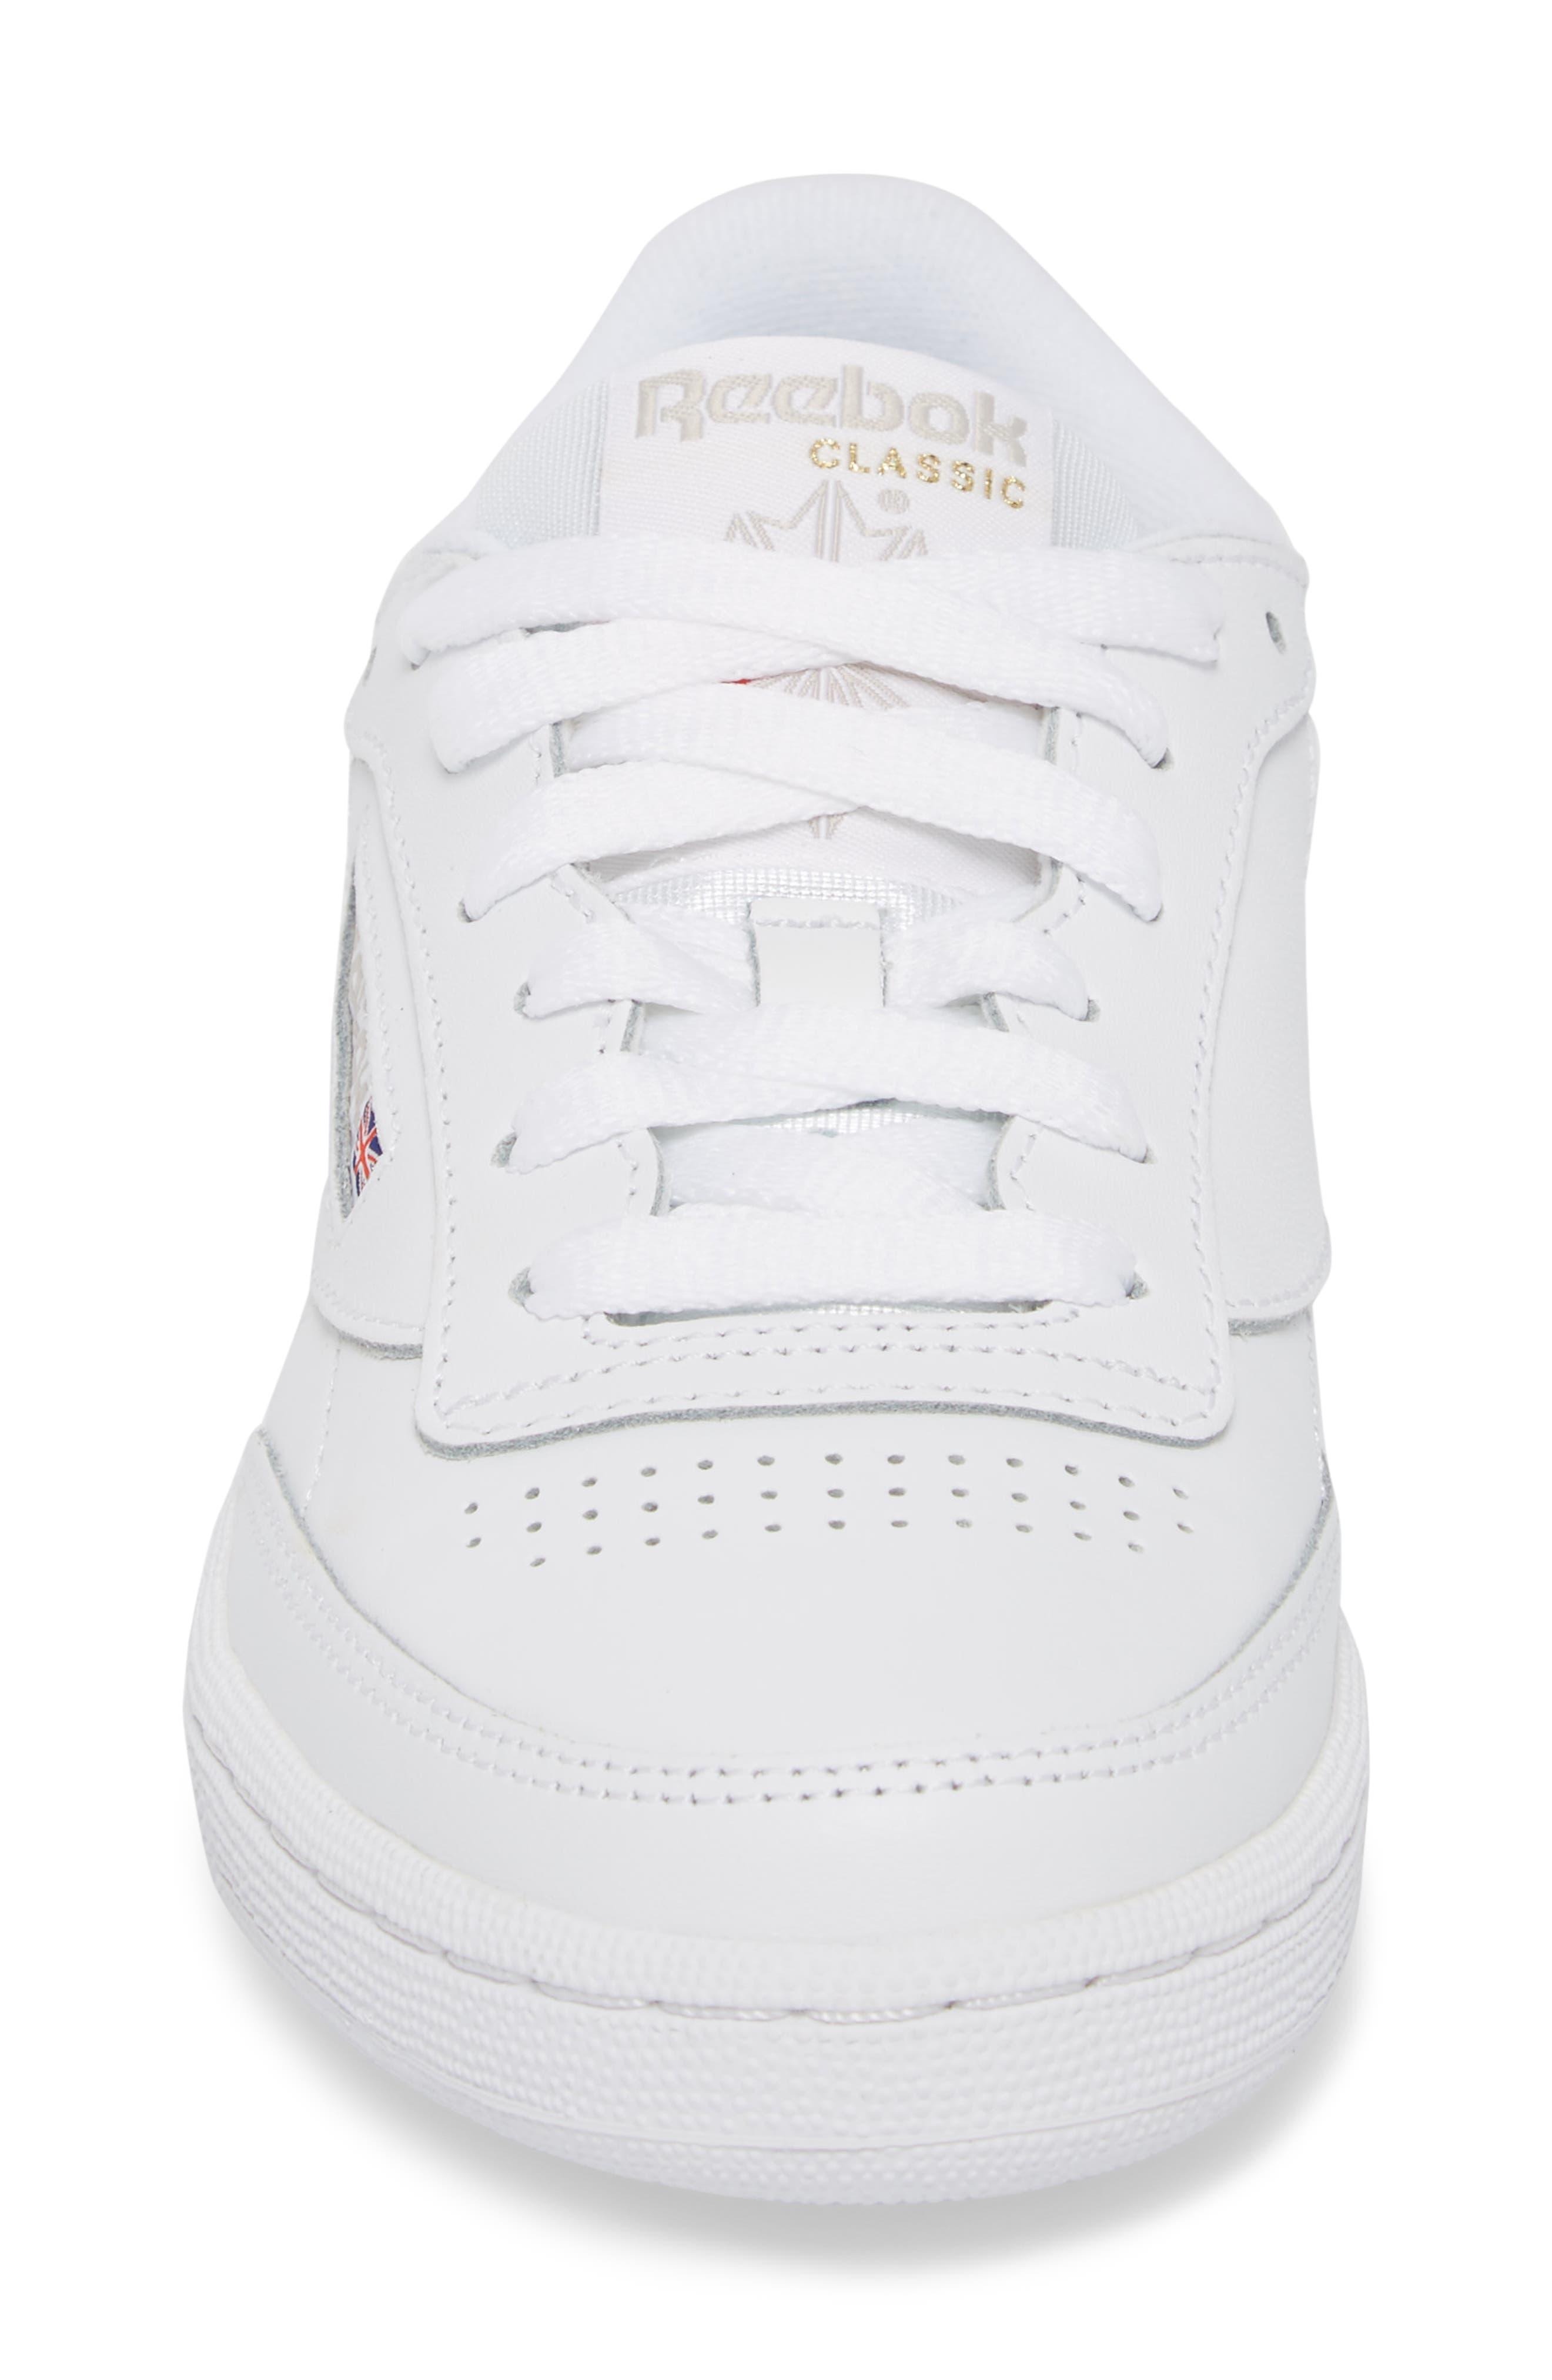 Club C 85 Sneaker,                             Alternate thumbnail 4, color,                             WHITE/ LIGHT GREY